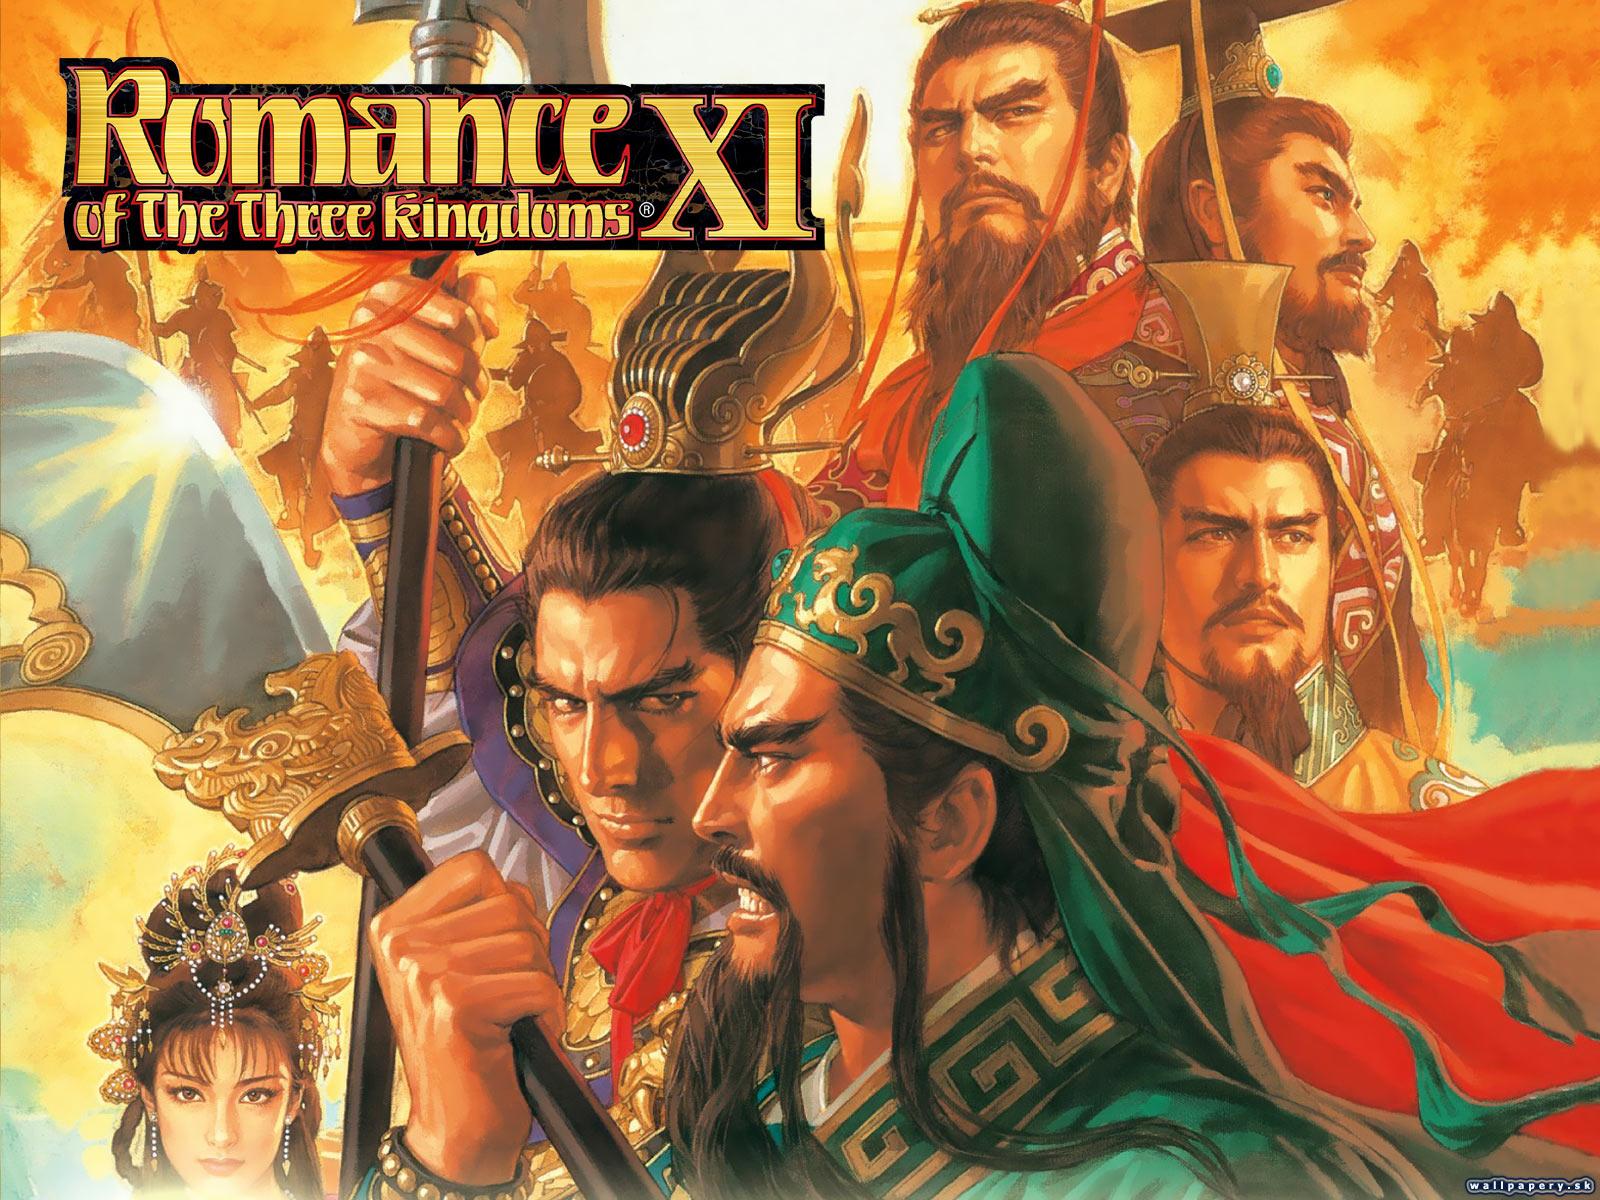 Lostlevel Blog Game Ps4 Romance Of The Three Kingdoms Xiii Reg 3 Tildes Birojs 2014 Crack